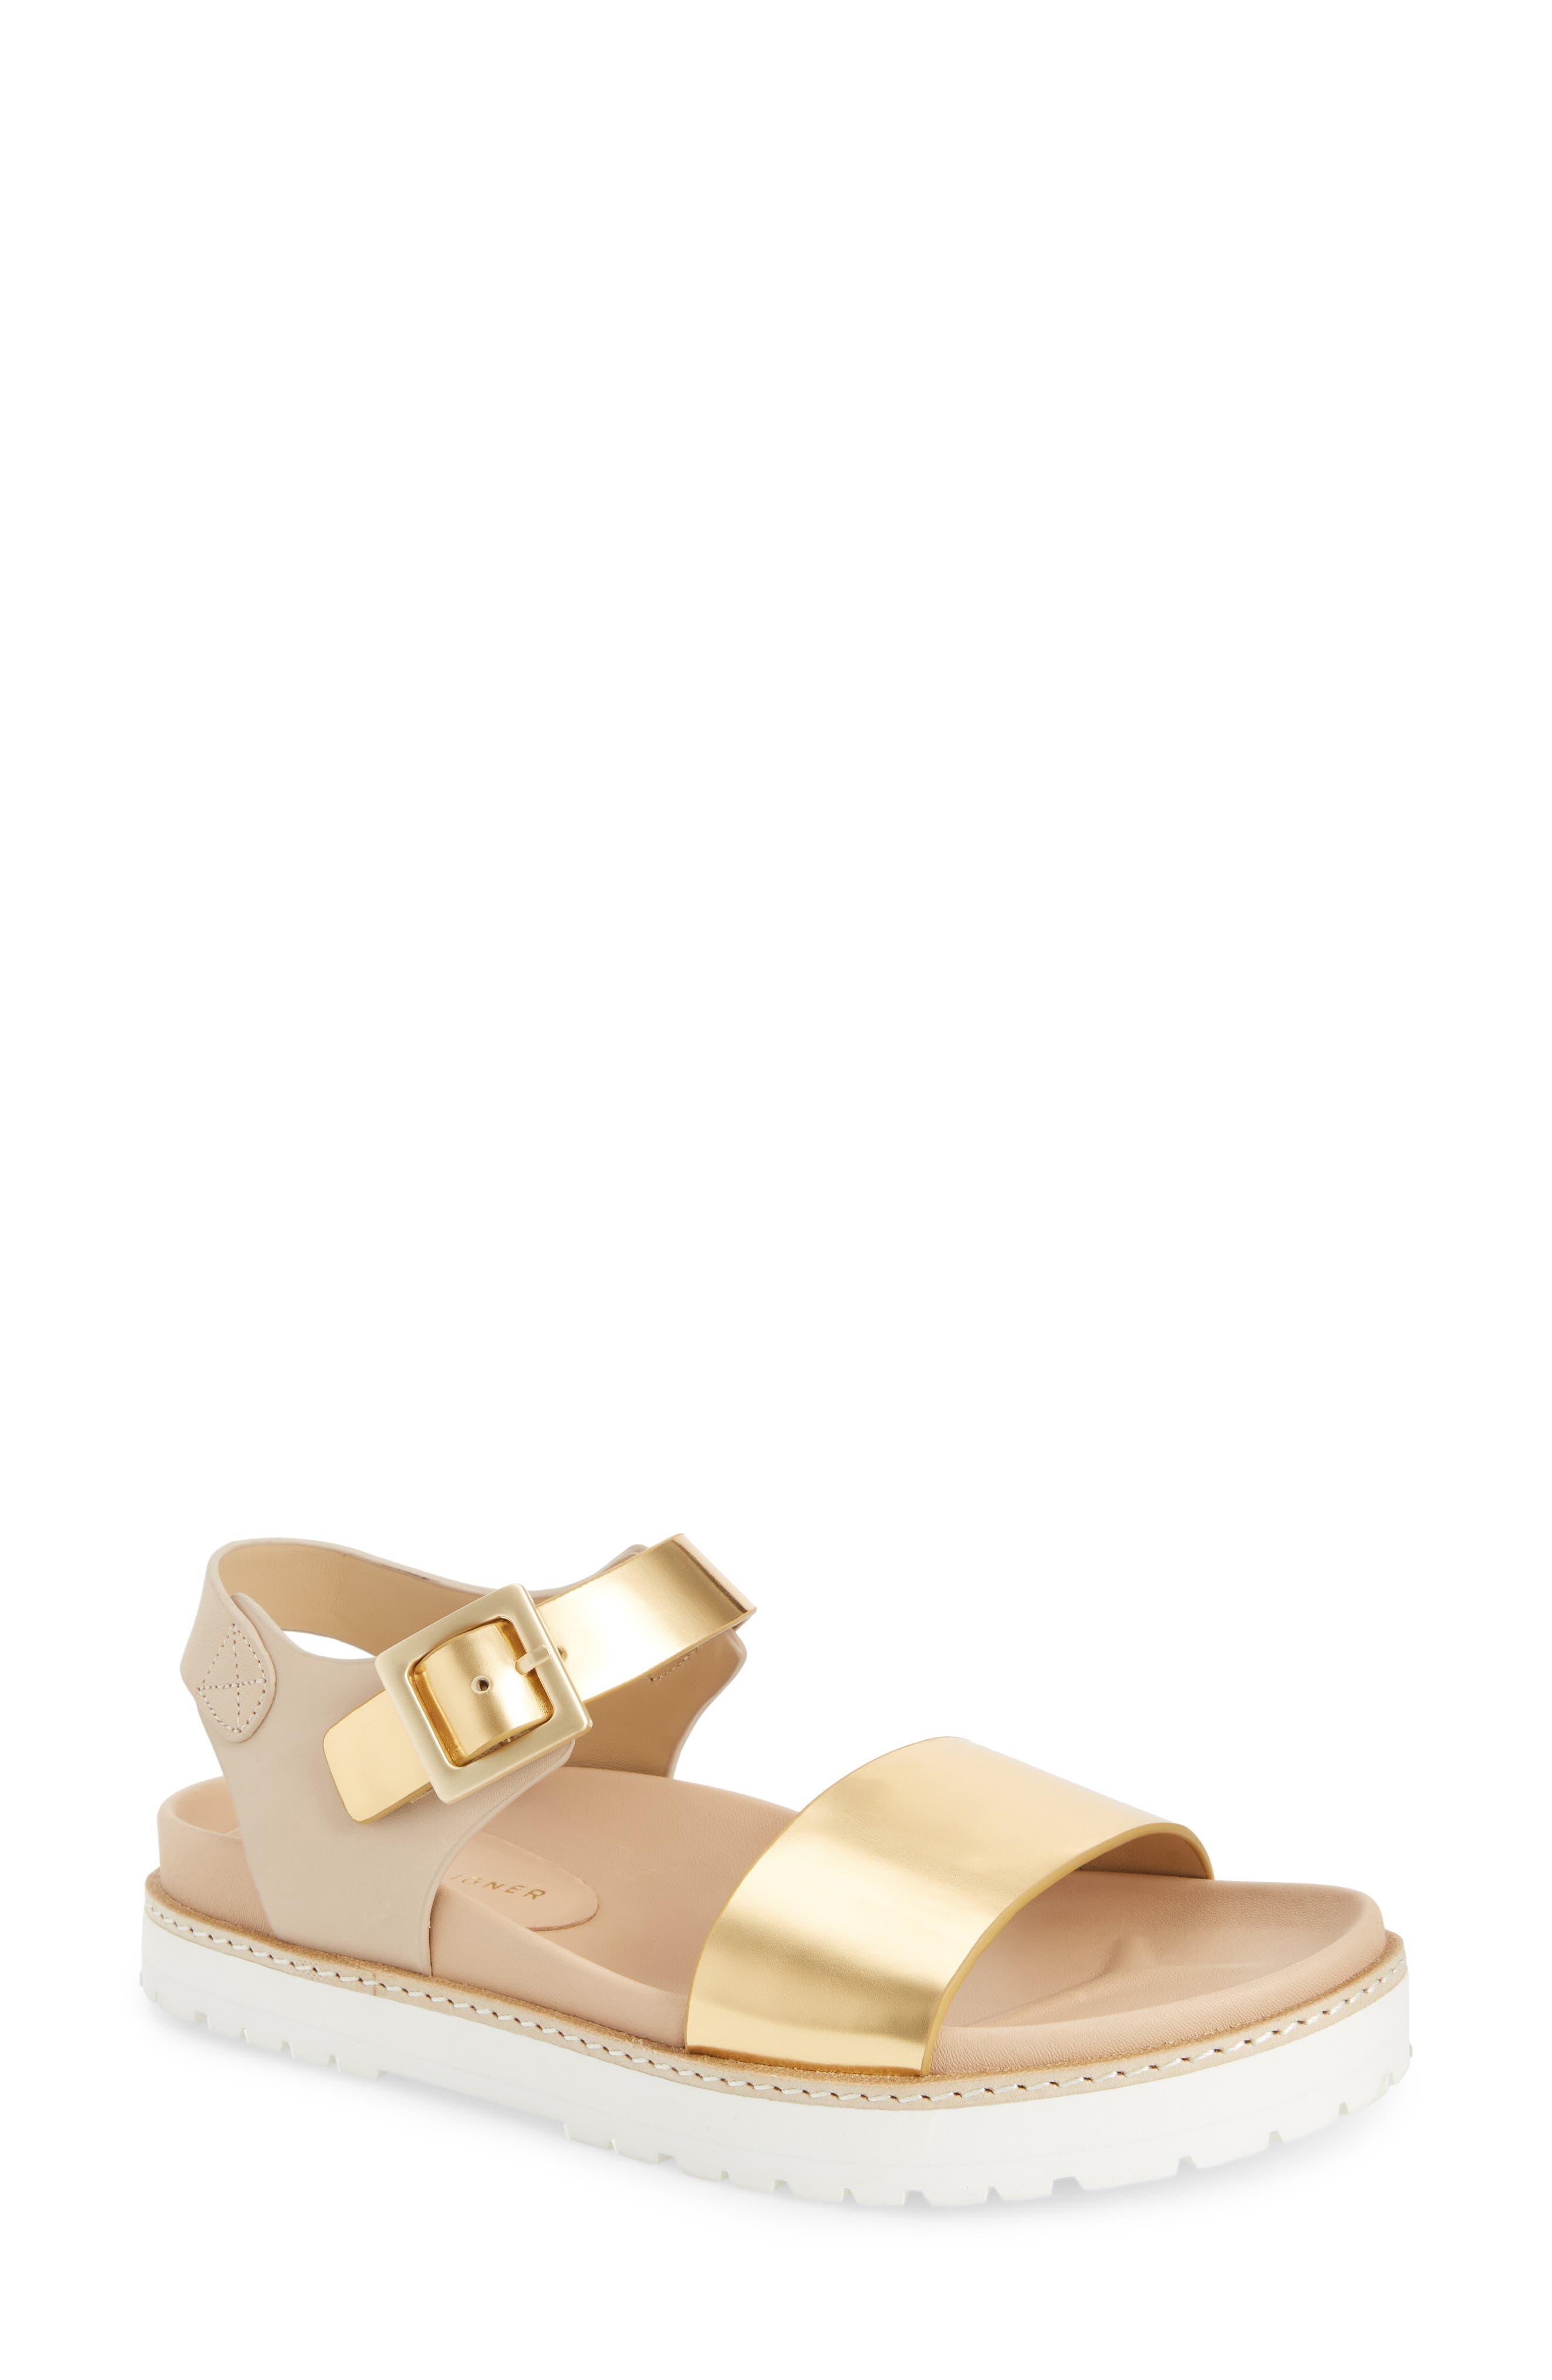 Ange Sandal,                         Main,                         color, Gold/ Natural Leather